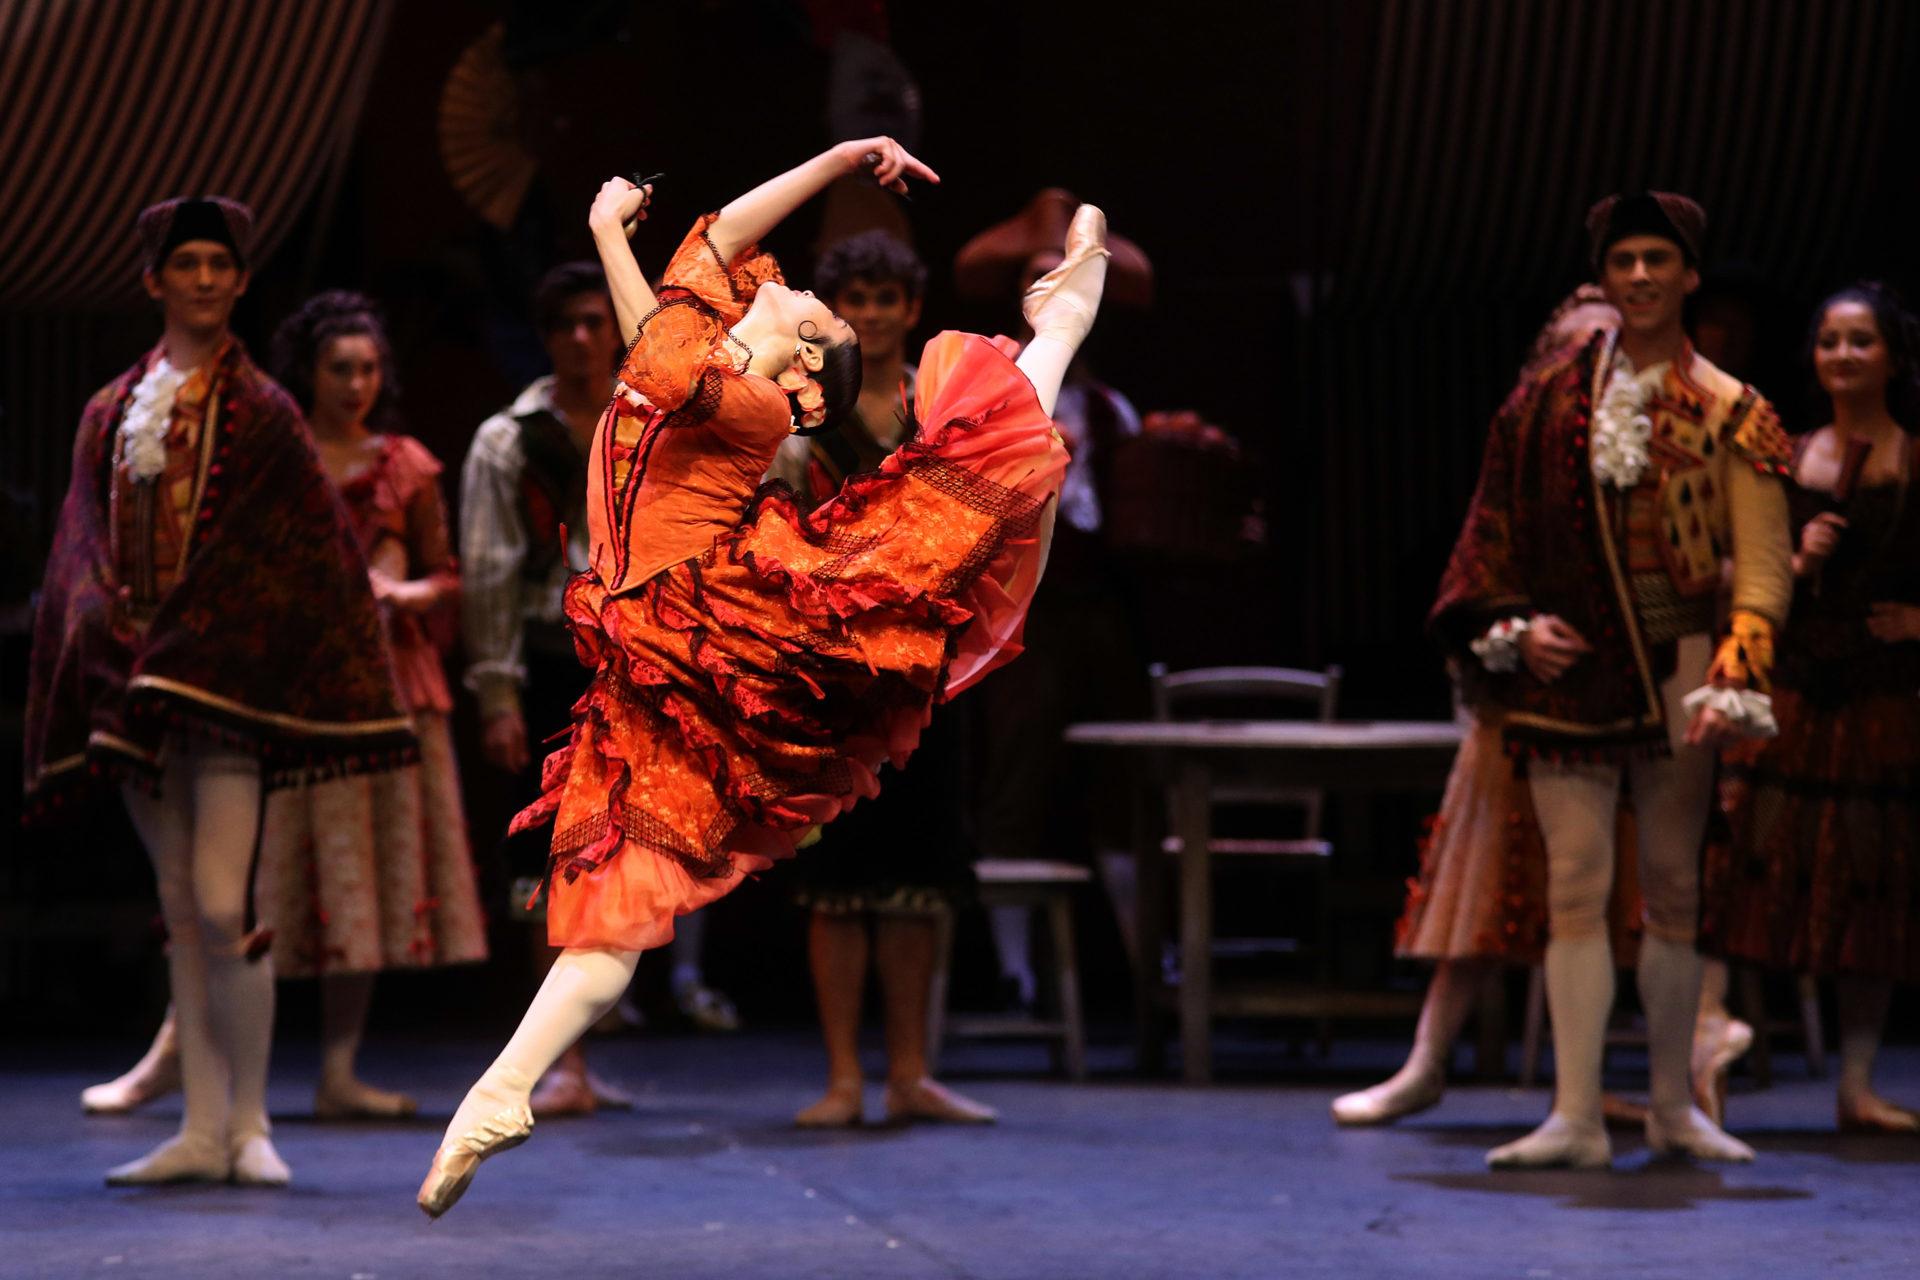 Don_Quixote_HH_Ballett_Foto_AnjaBeutler.de_231